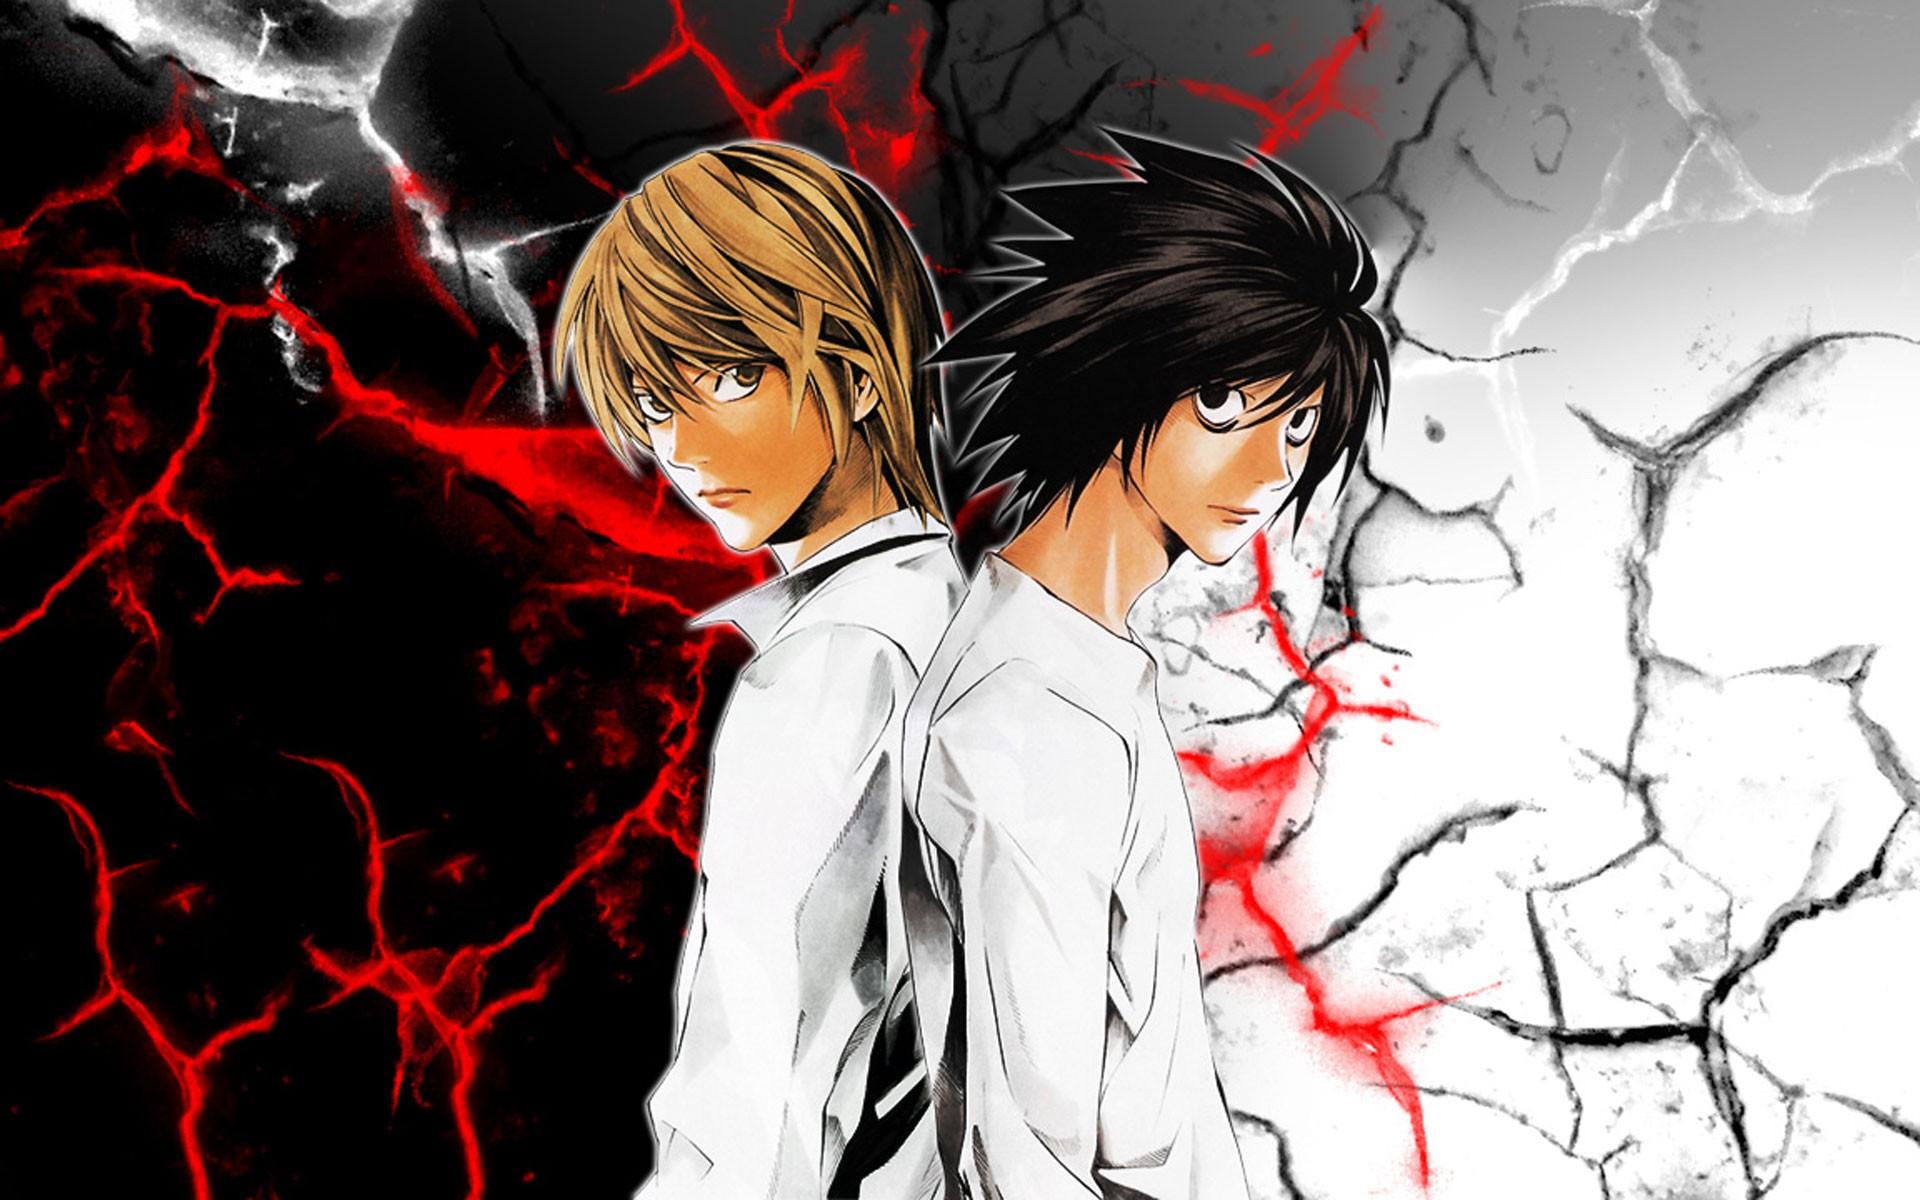 Wallpaper Illustration Anime Death Note Yagami Light Cracked